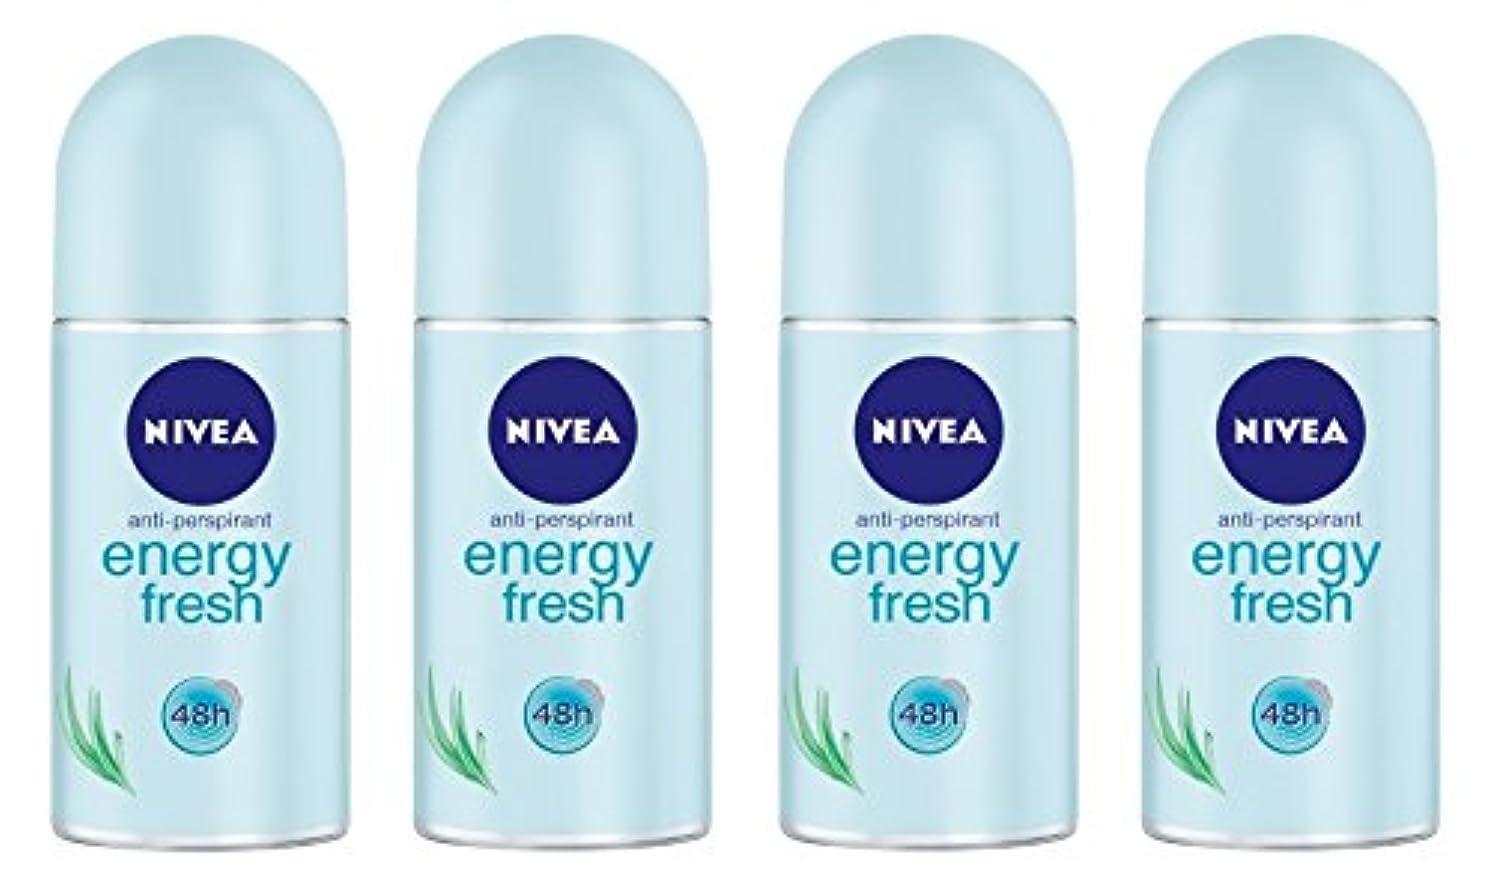 (Pack of 4) Nivea Energy Fresh Anti-perspirant Deodorant Roll On for Women 4x50ml - (4パック) ニベアエネルギー新鮮な制汗剤デオドラントロールオン...